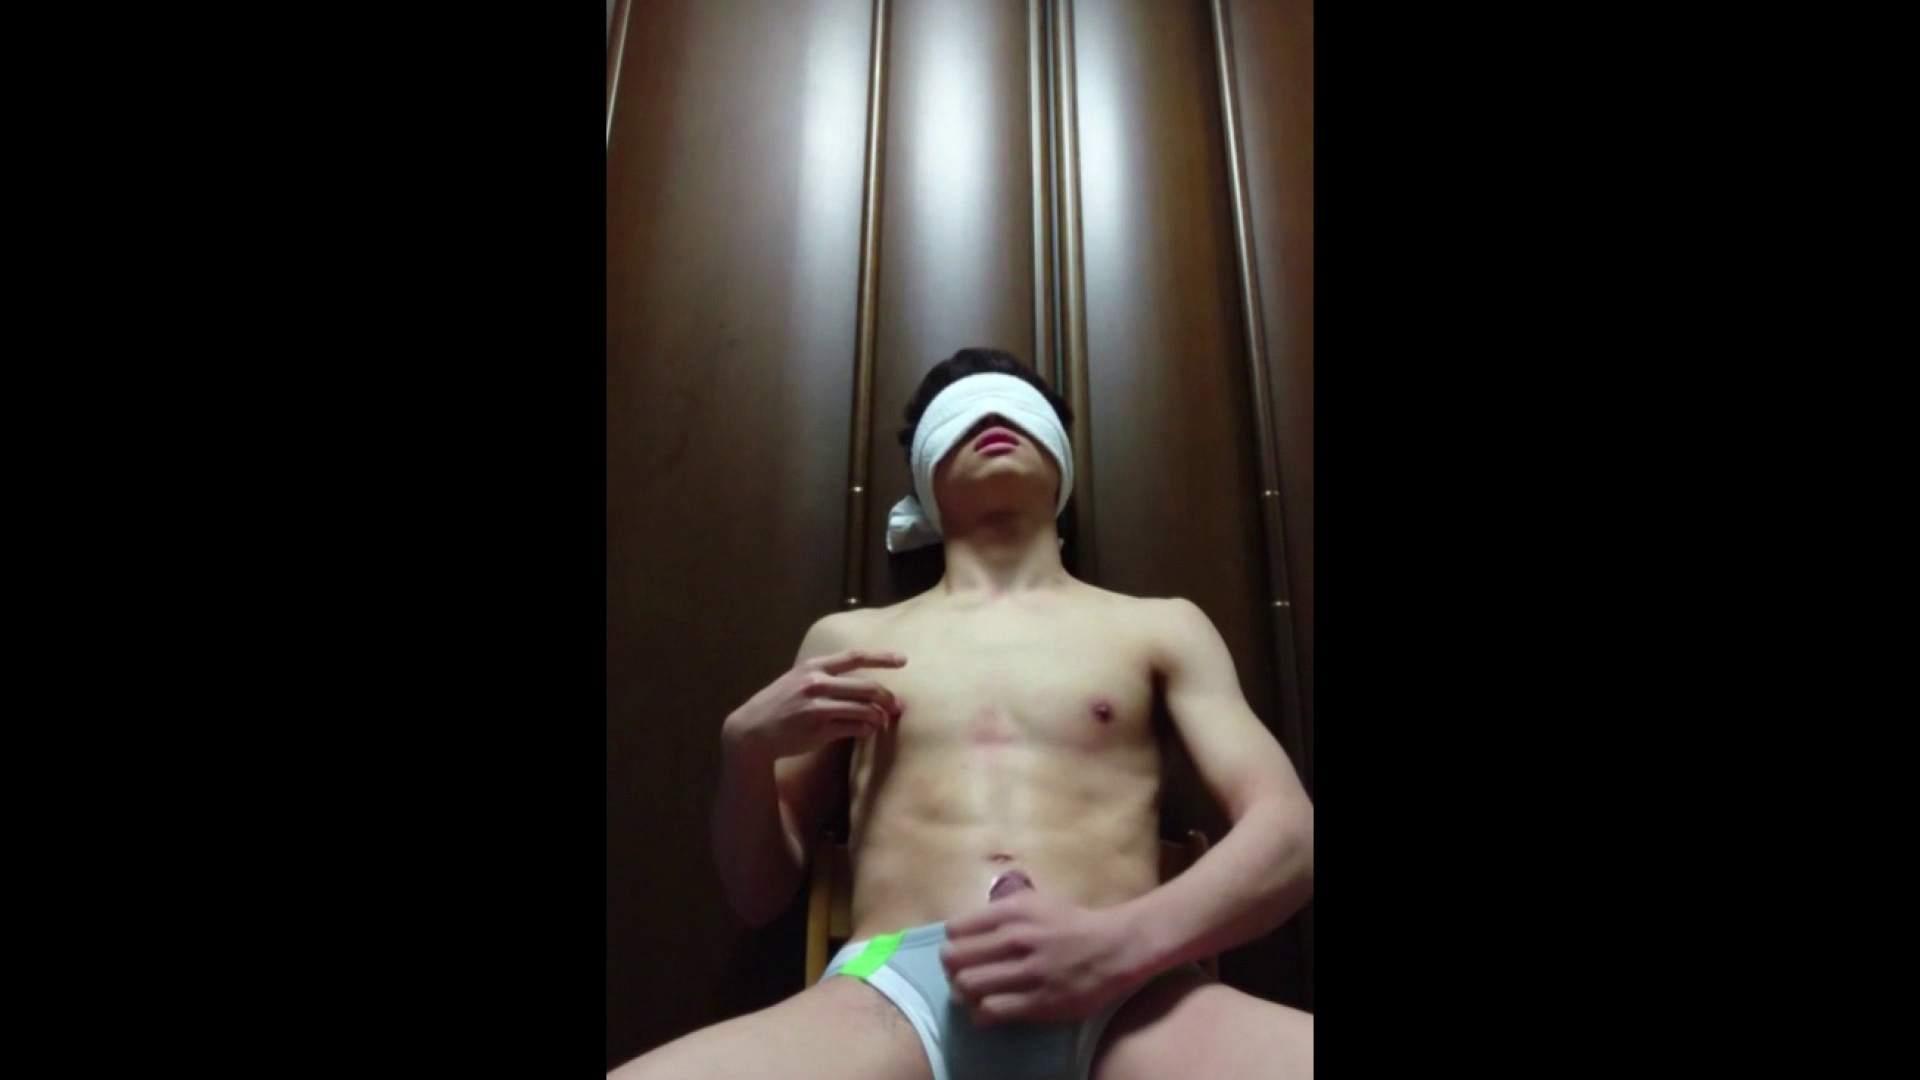 個人撮影 自慰の極意 Vol.21 無修正 男同士動画 93pic 8